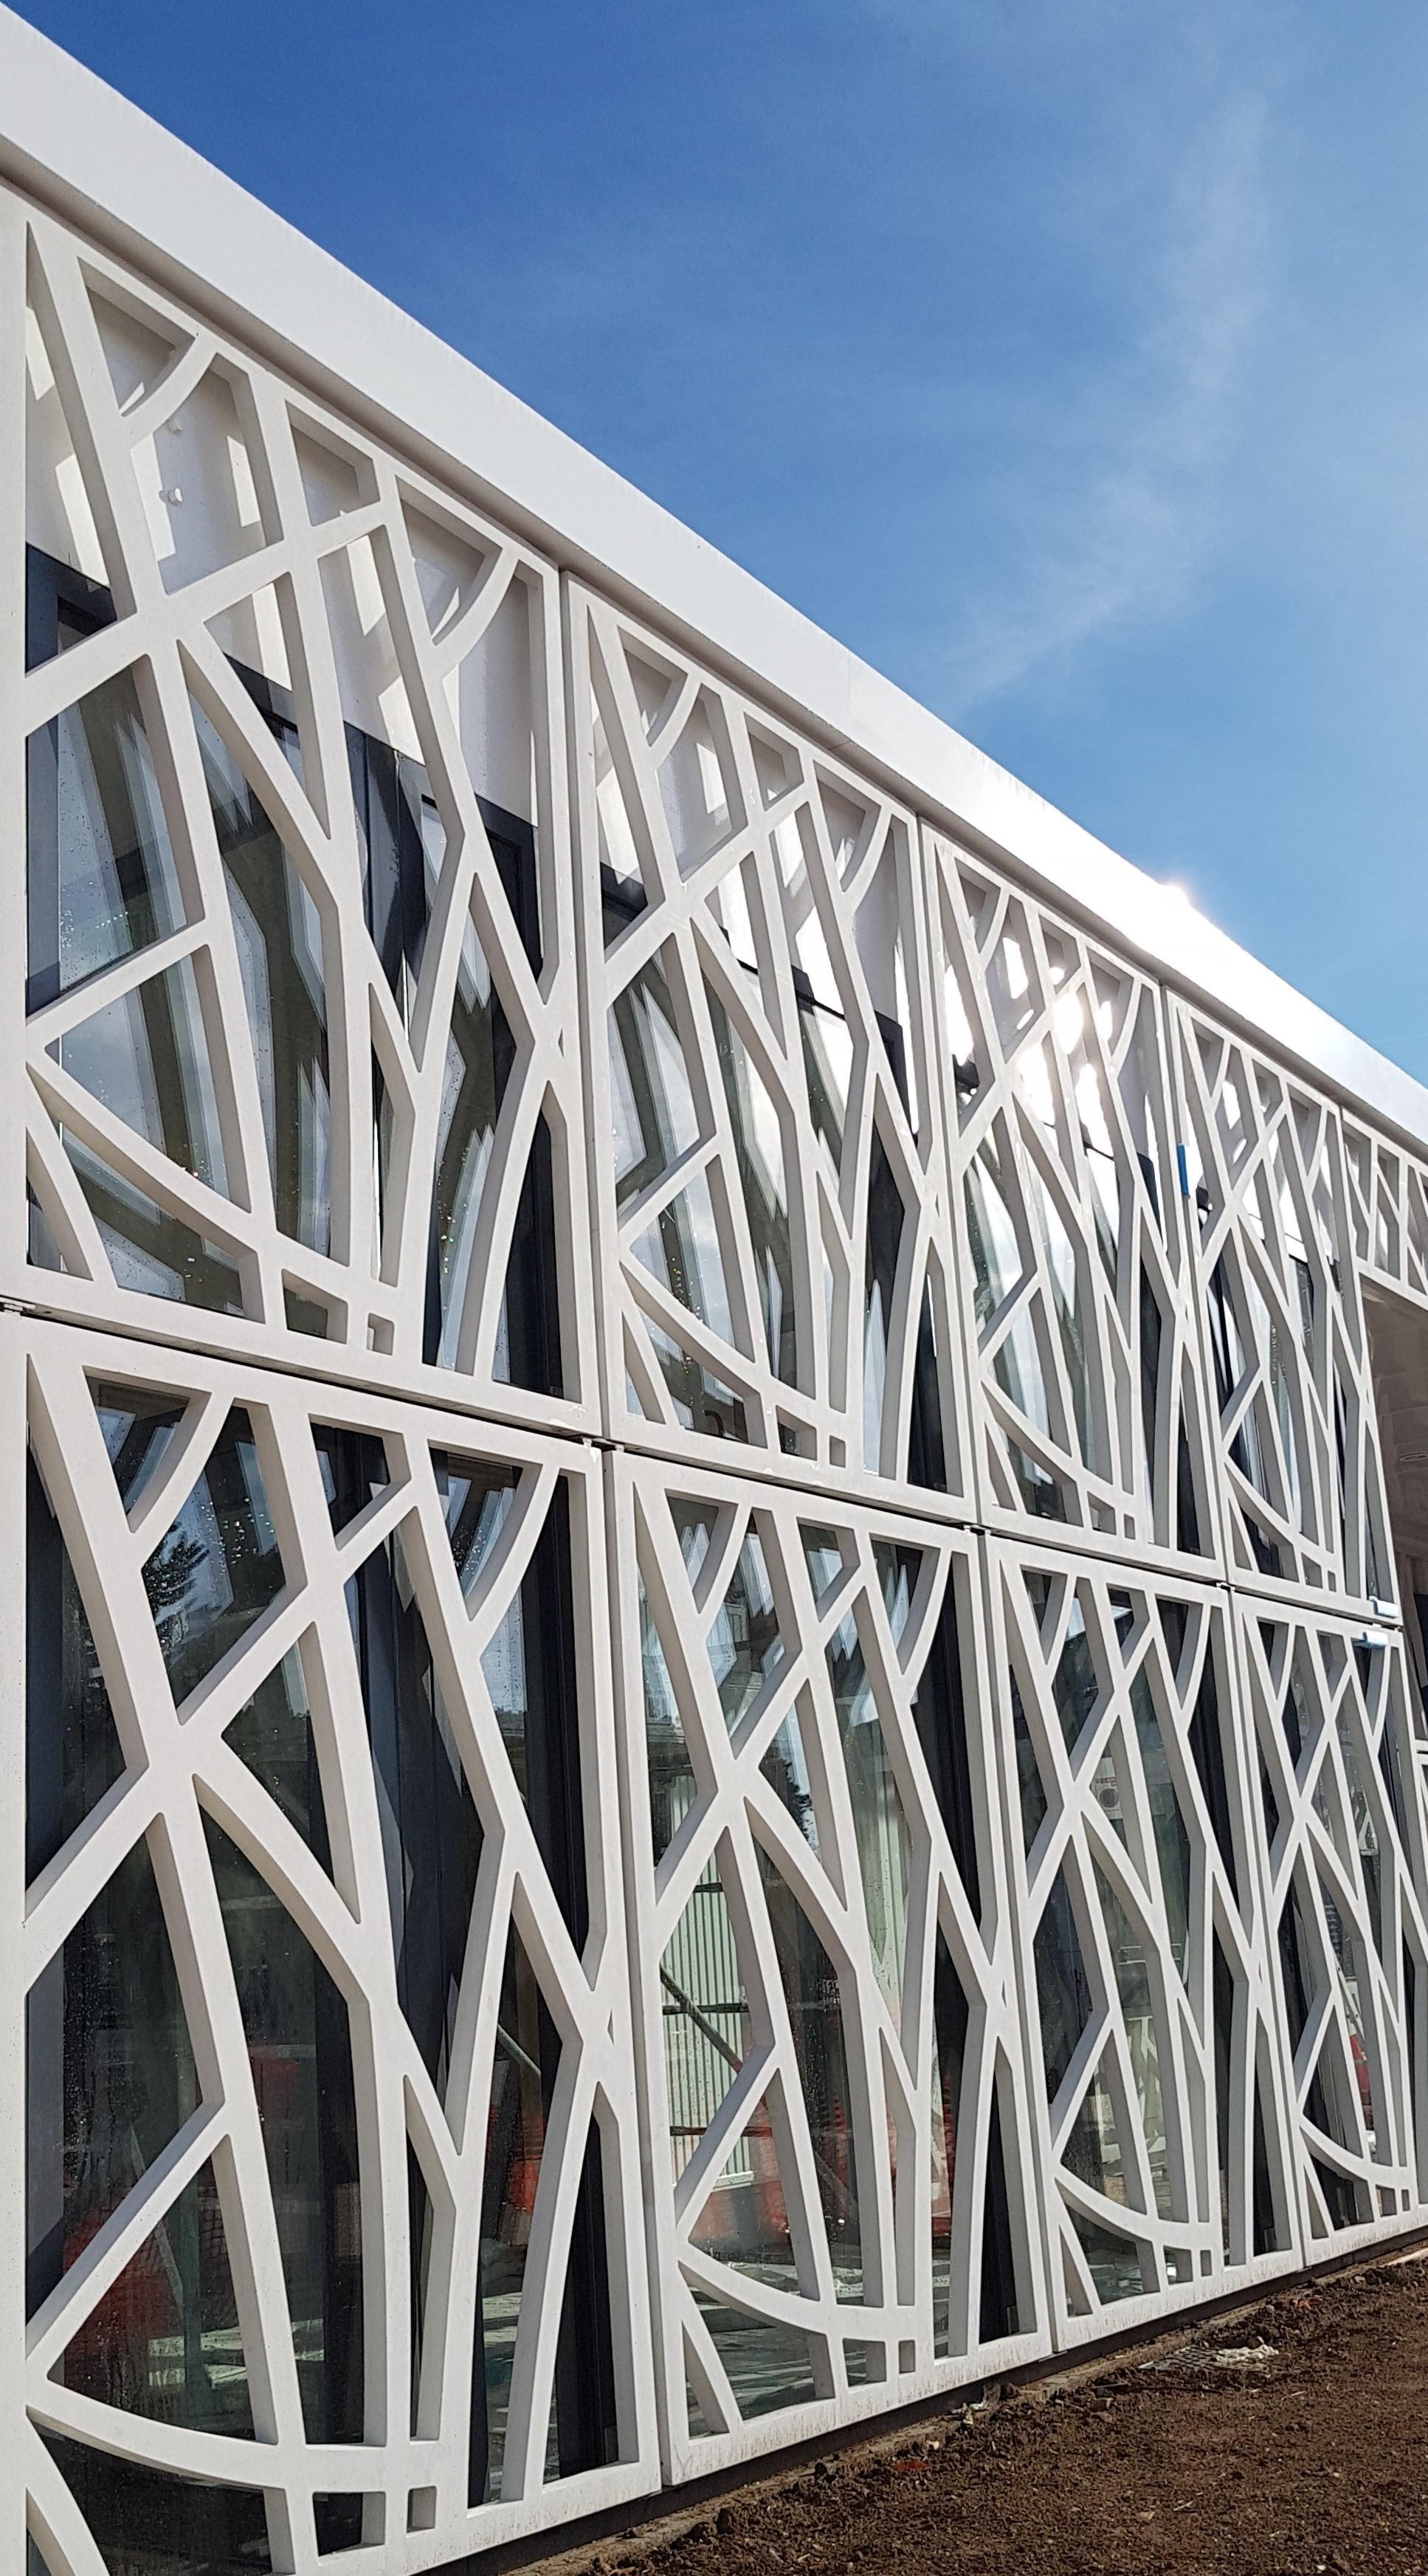 Perforated facade anchoring